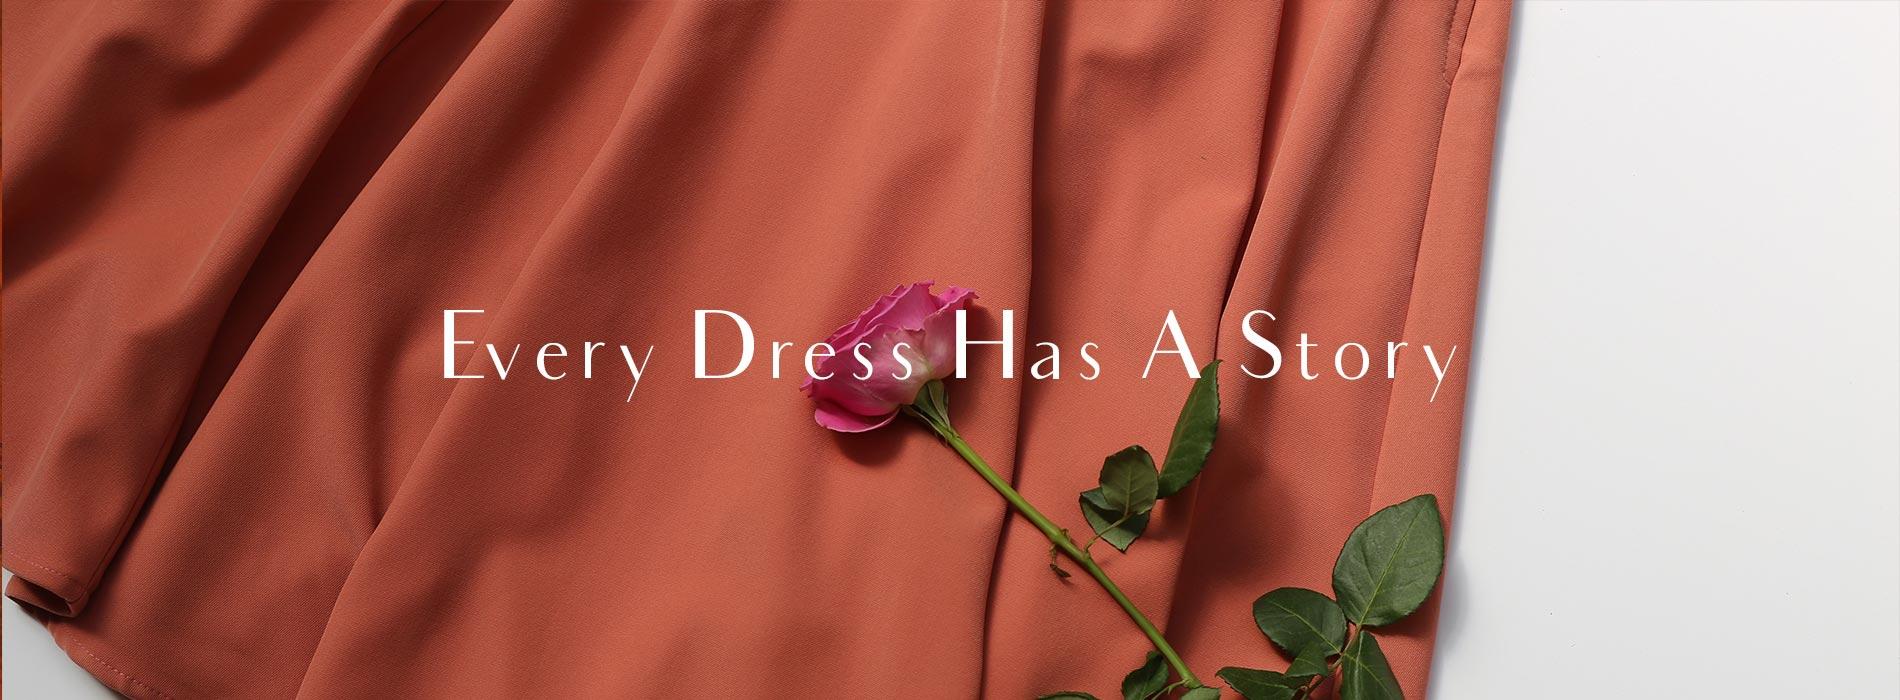 Every Dress Has A Story